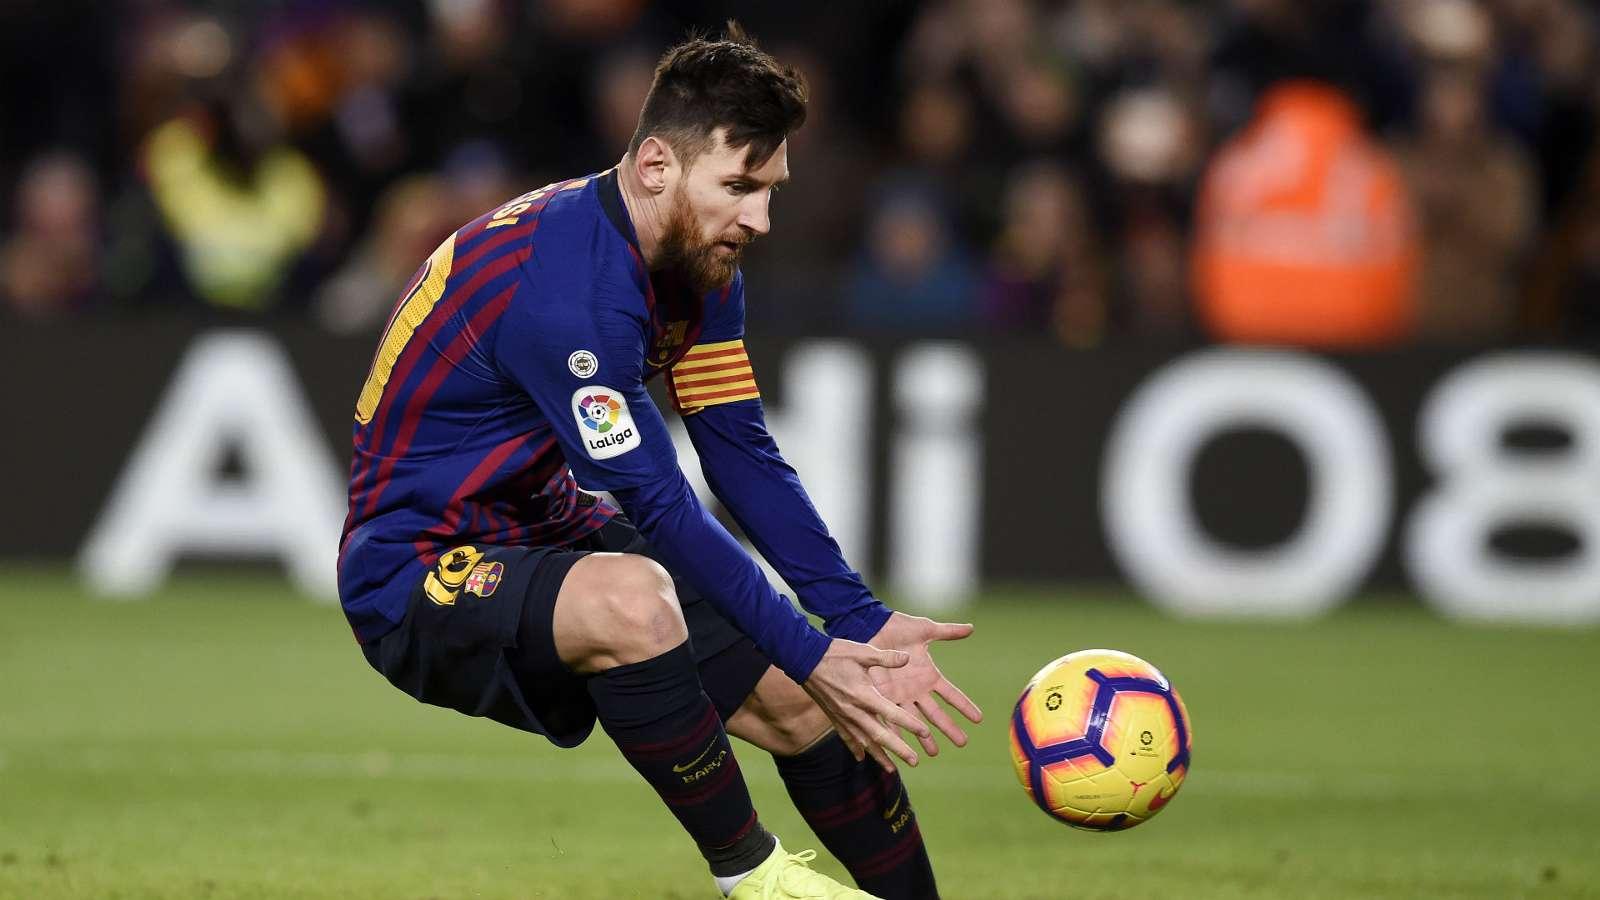 lionelmessi cropped efjyq521bzv615xoz78fz2lo5 - Barcelona vs Valencia 2-2: LaLiga Match Report & Highlights